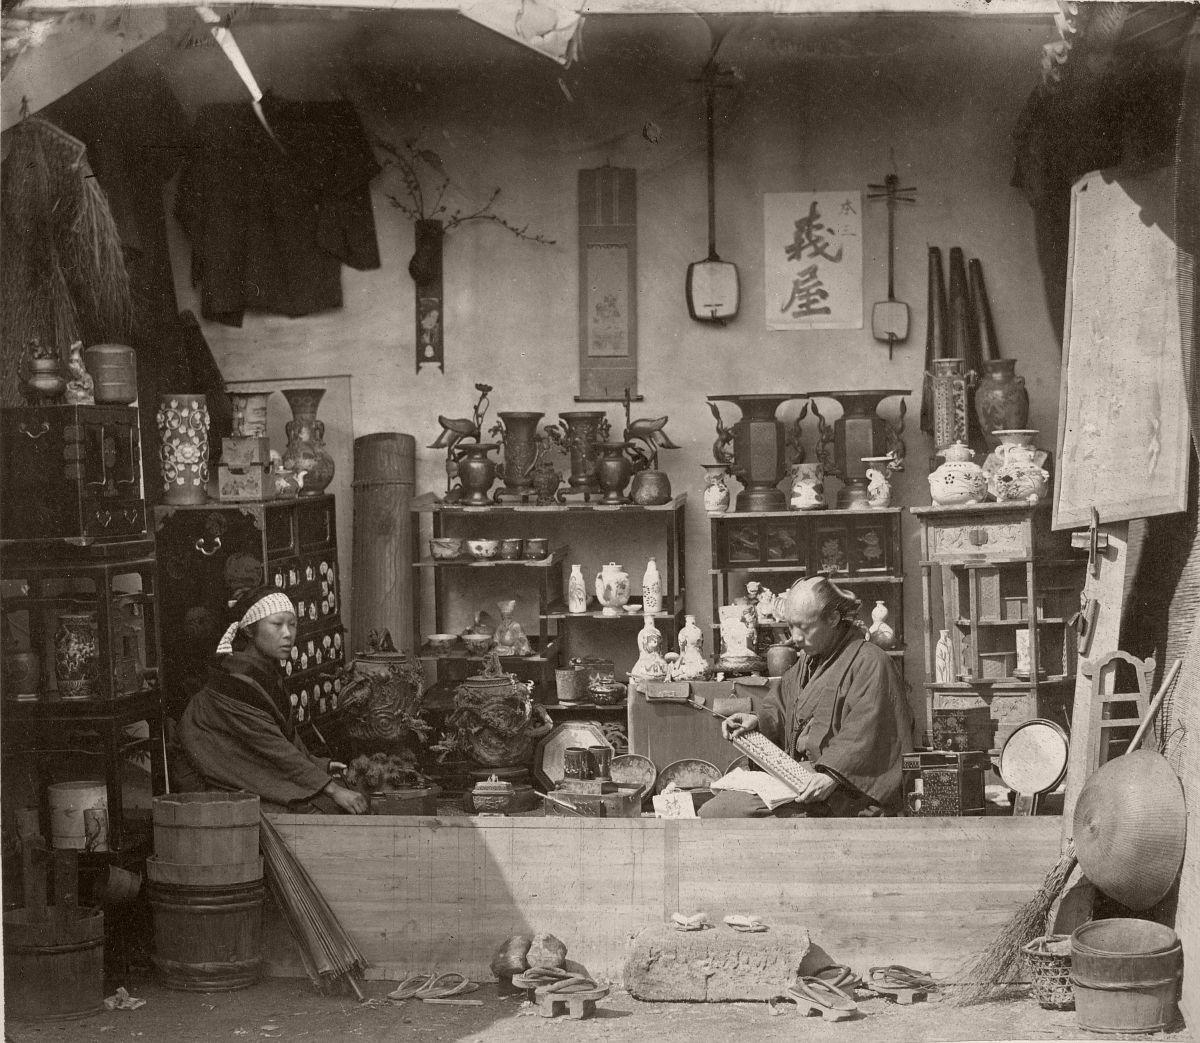 Curio Shop, Japan, 1868